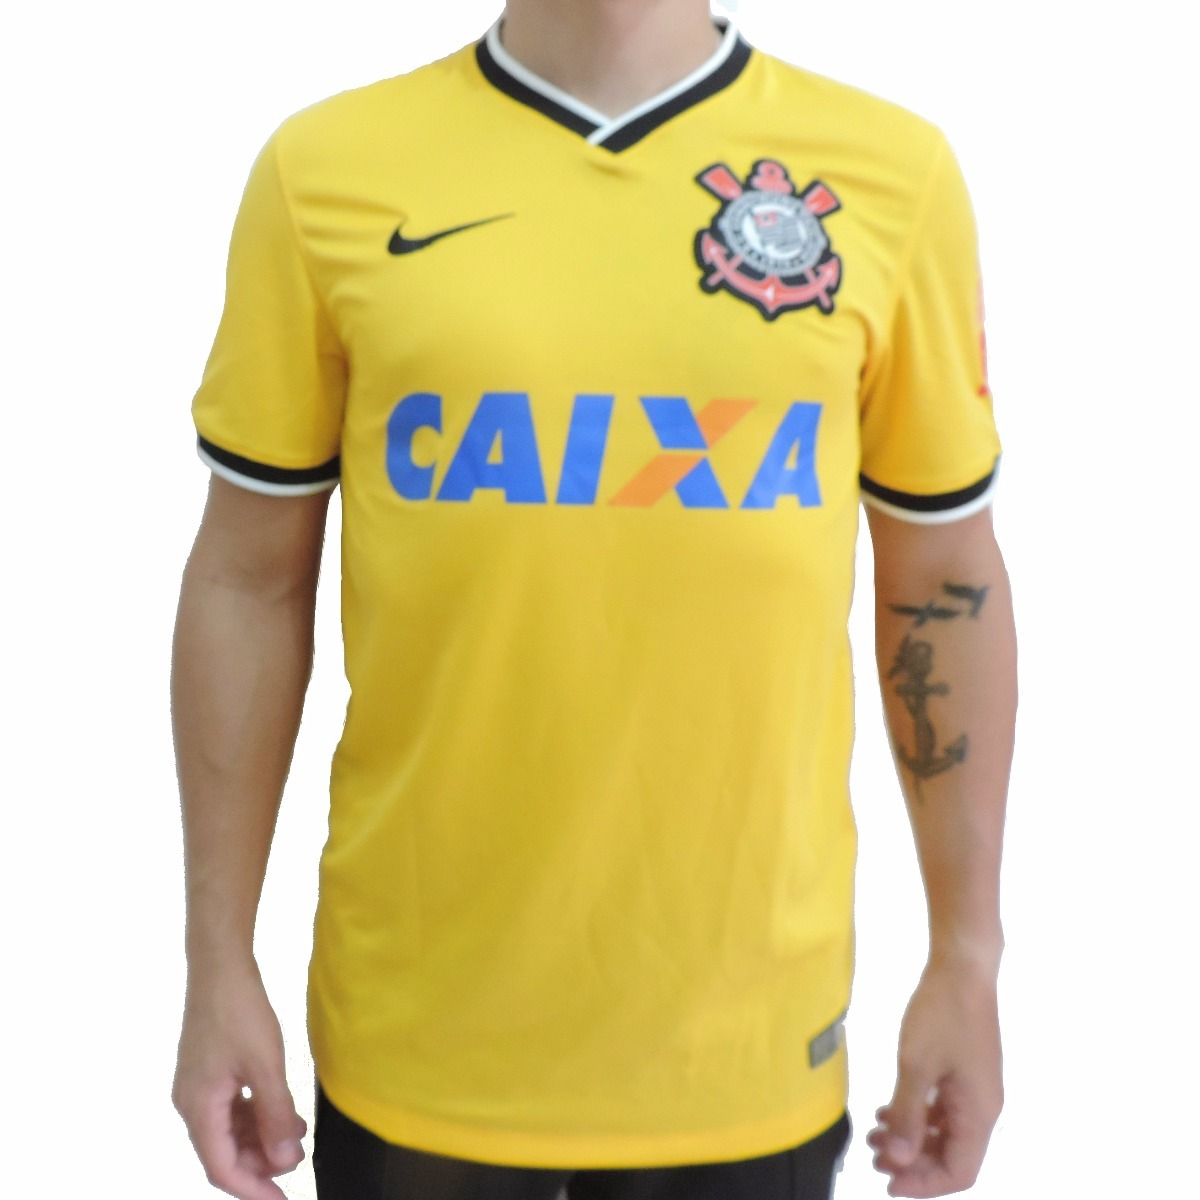 cf59bd122d Camisa Nike Corinthians 14 Oficial Amarela De R 129